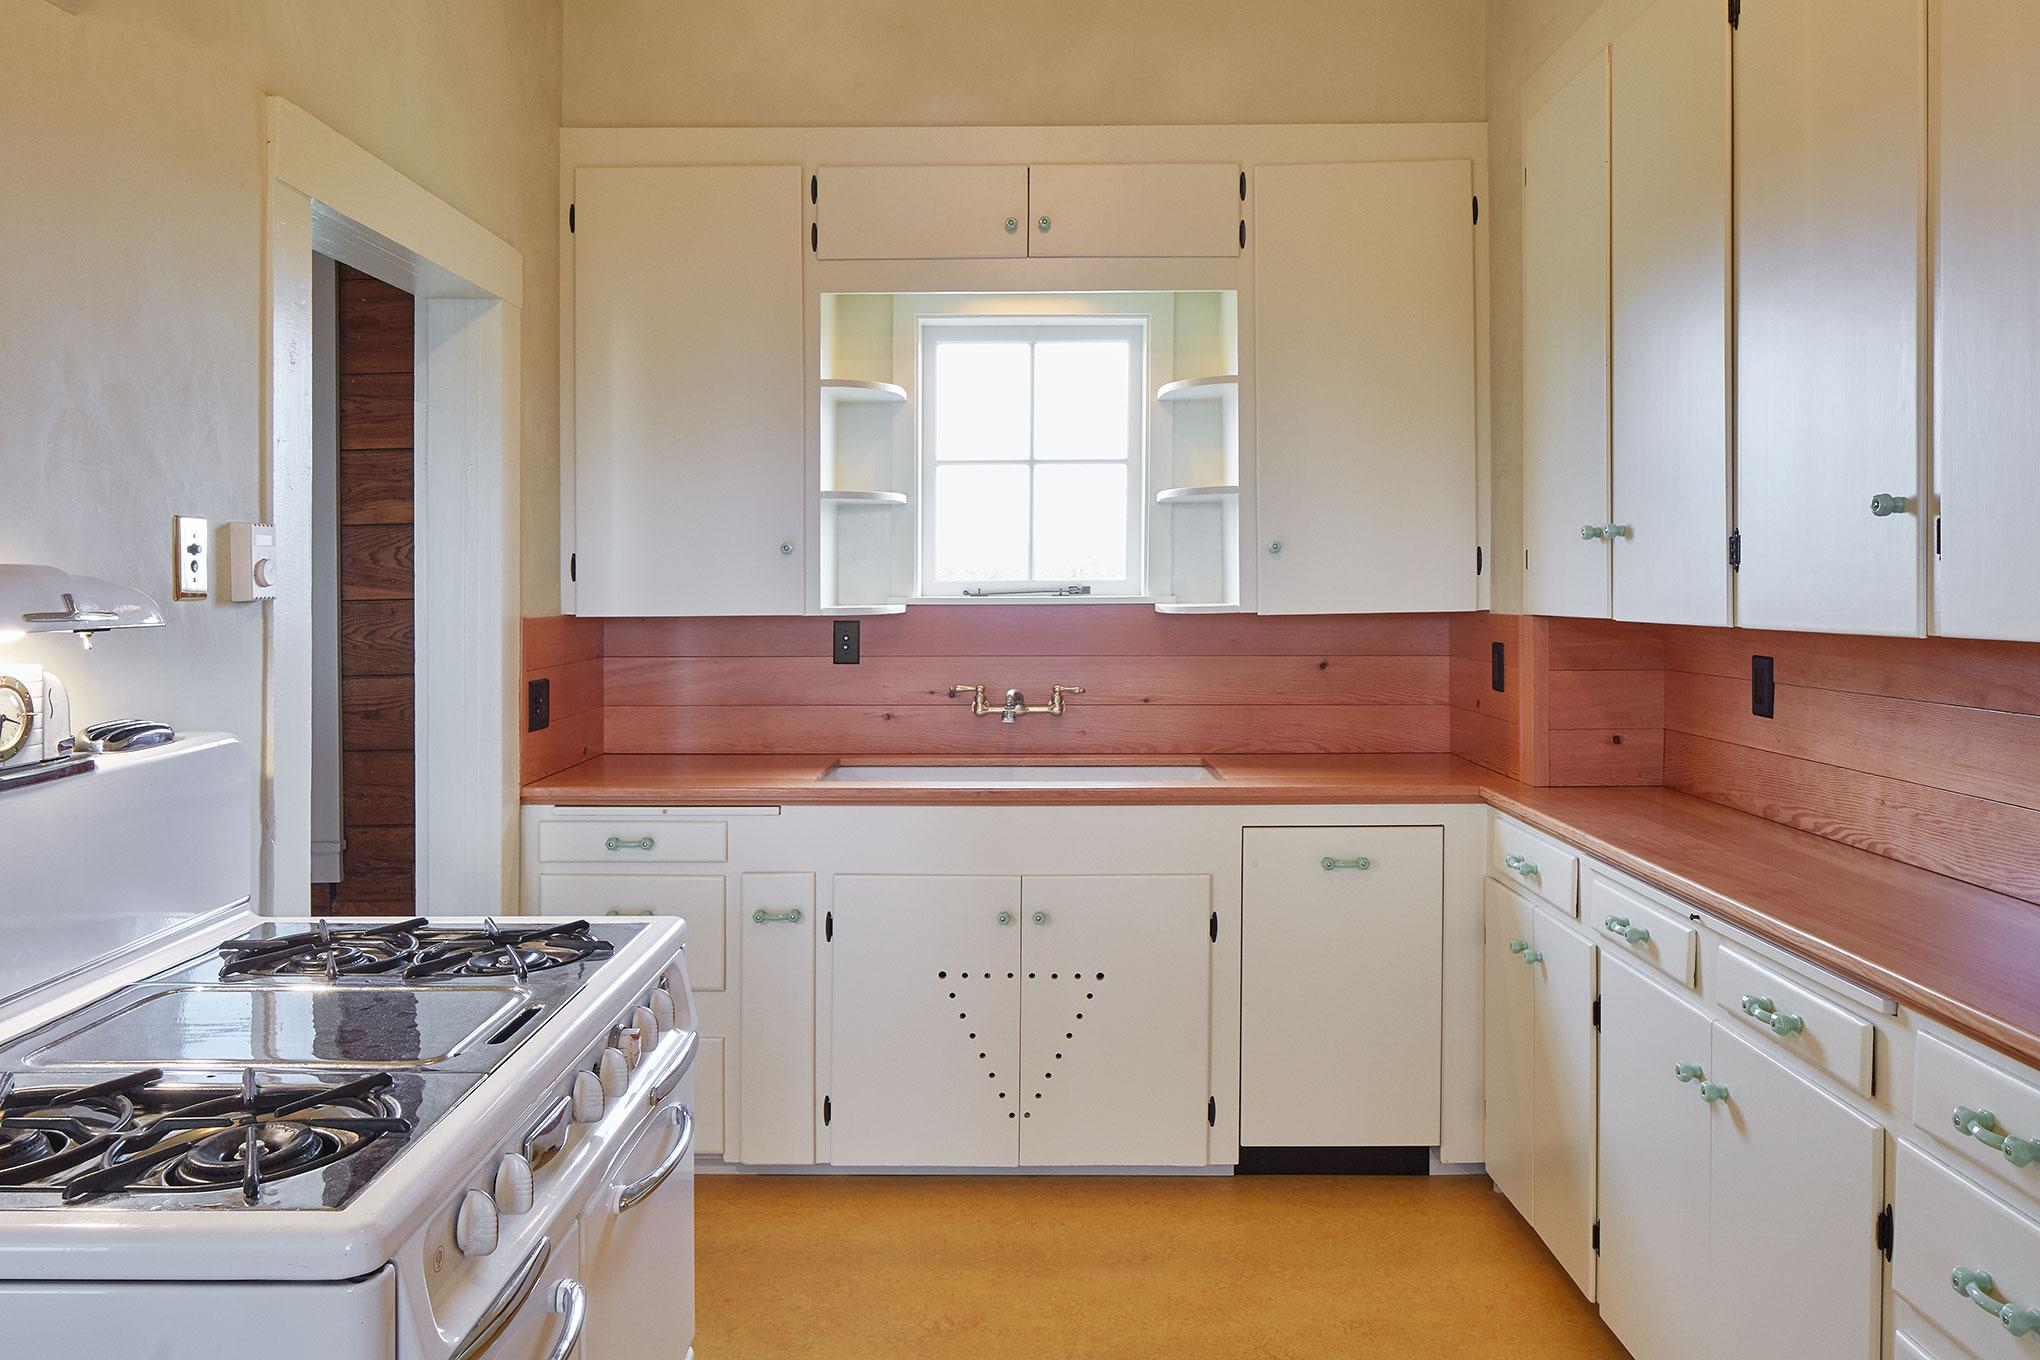 Beeks House kitchen